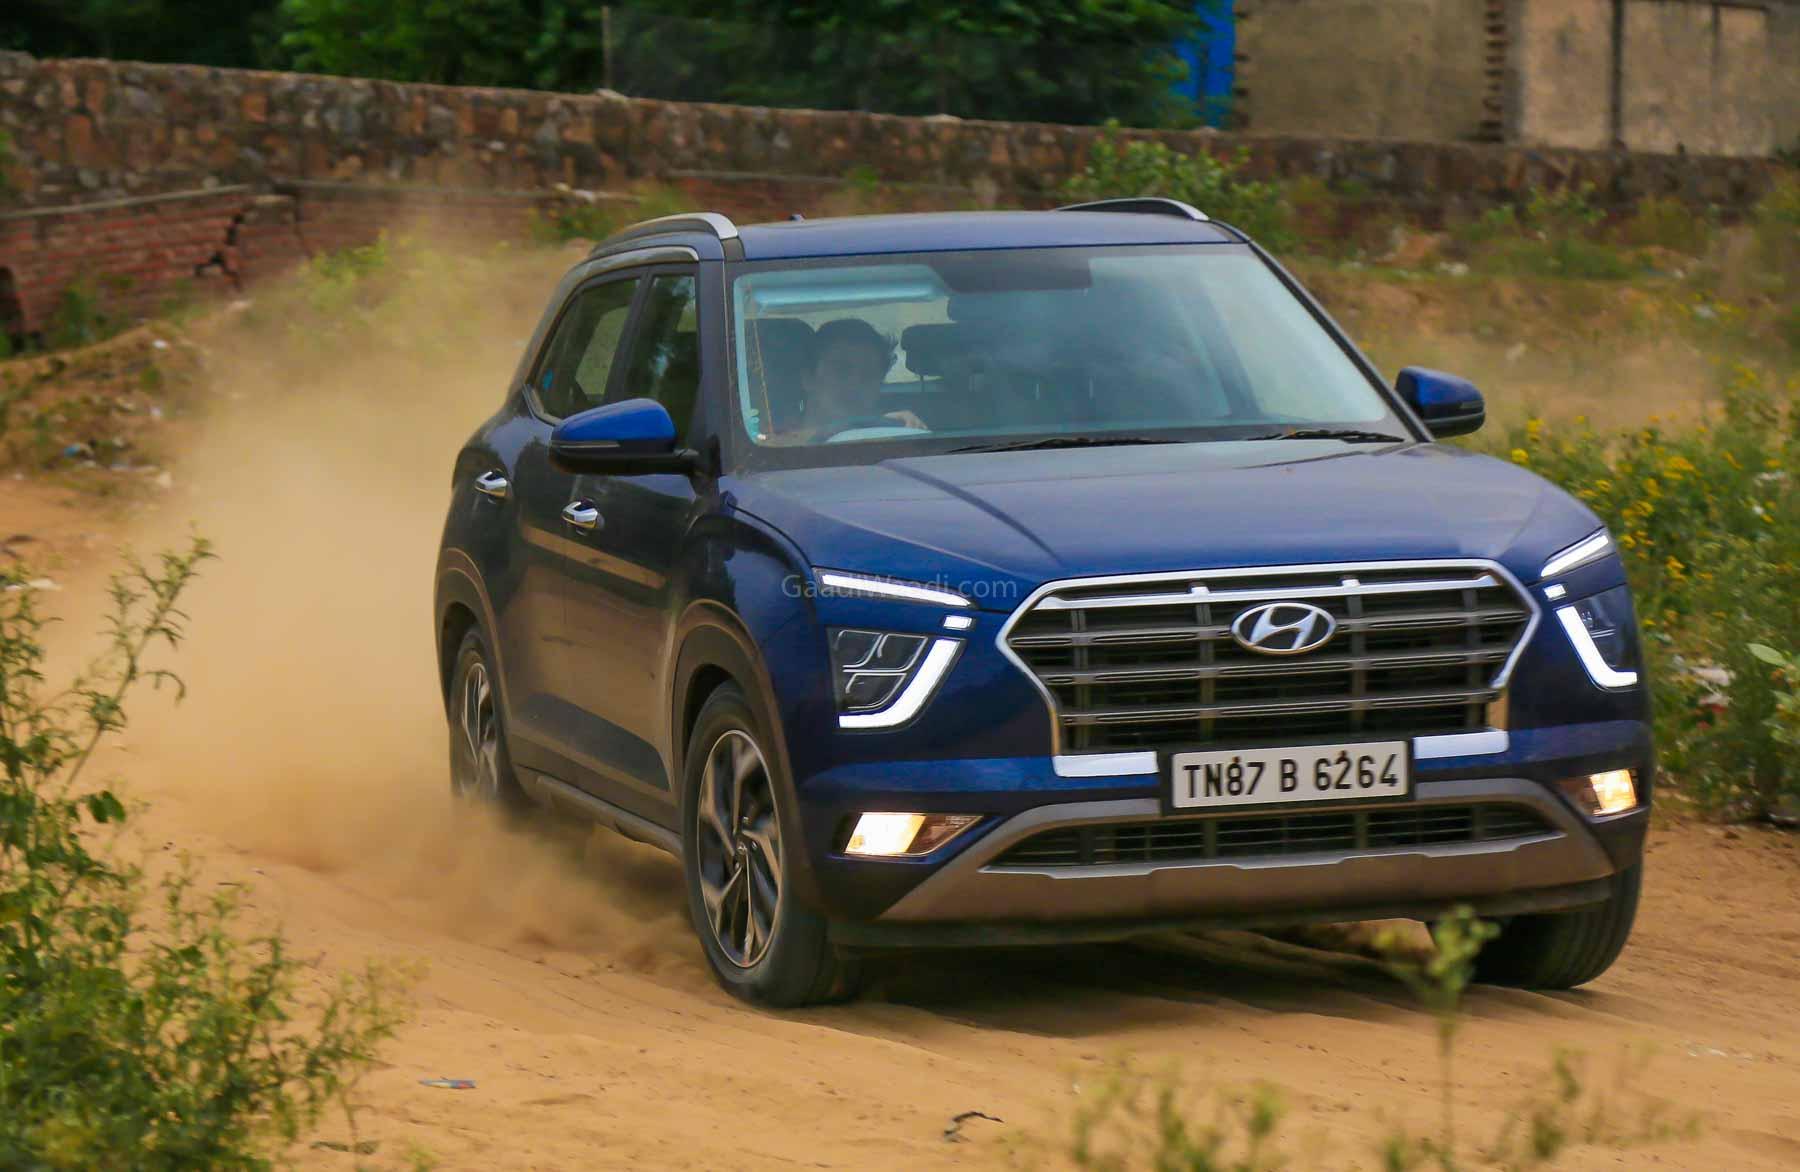 New-Gen Hyundai Creta Beats Kia Seltos Again In Monthly (June 2020) Sales